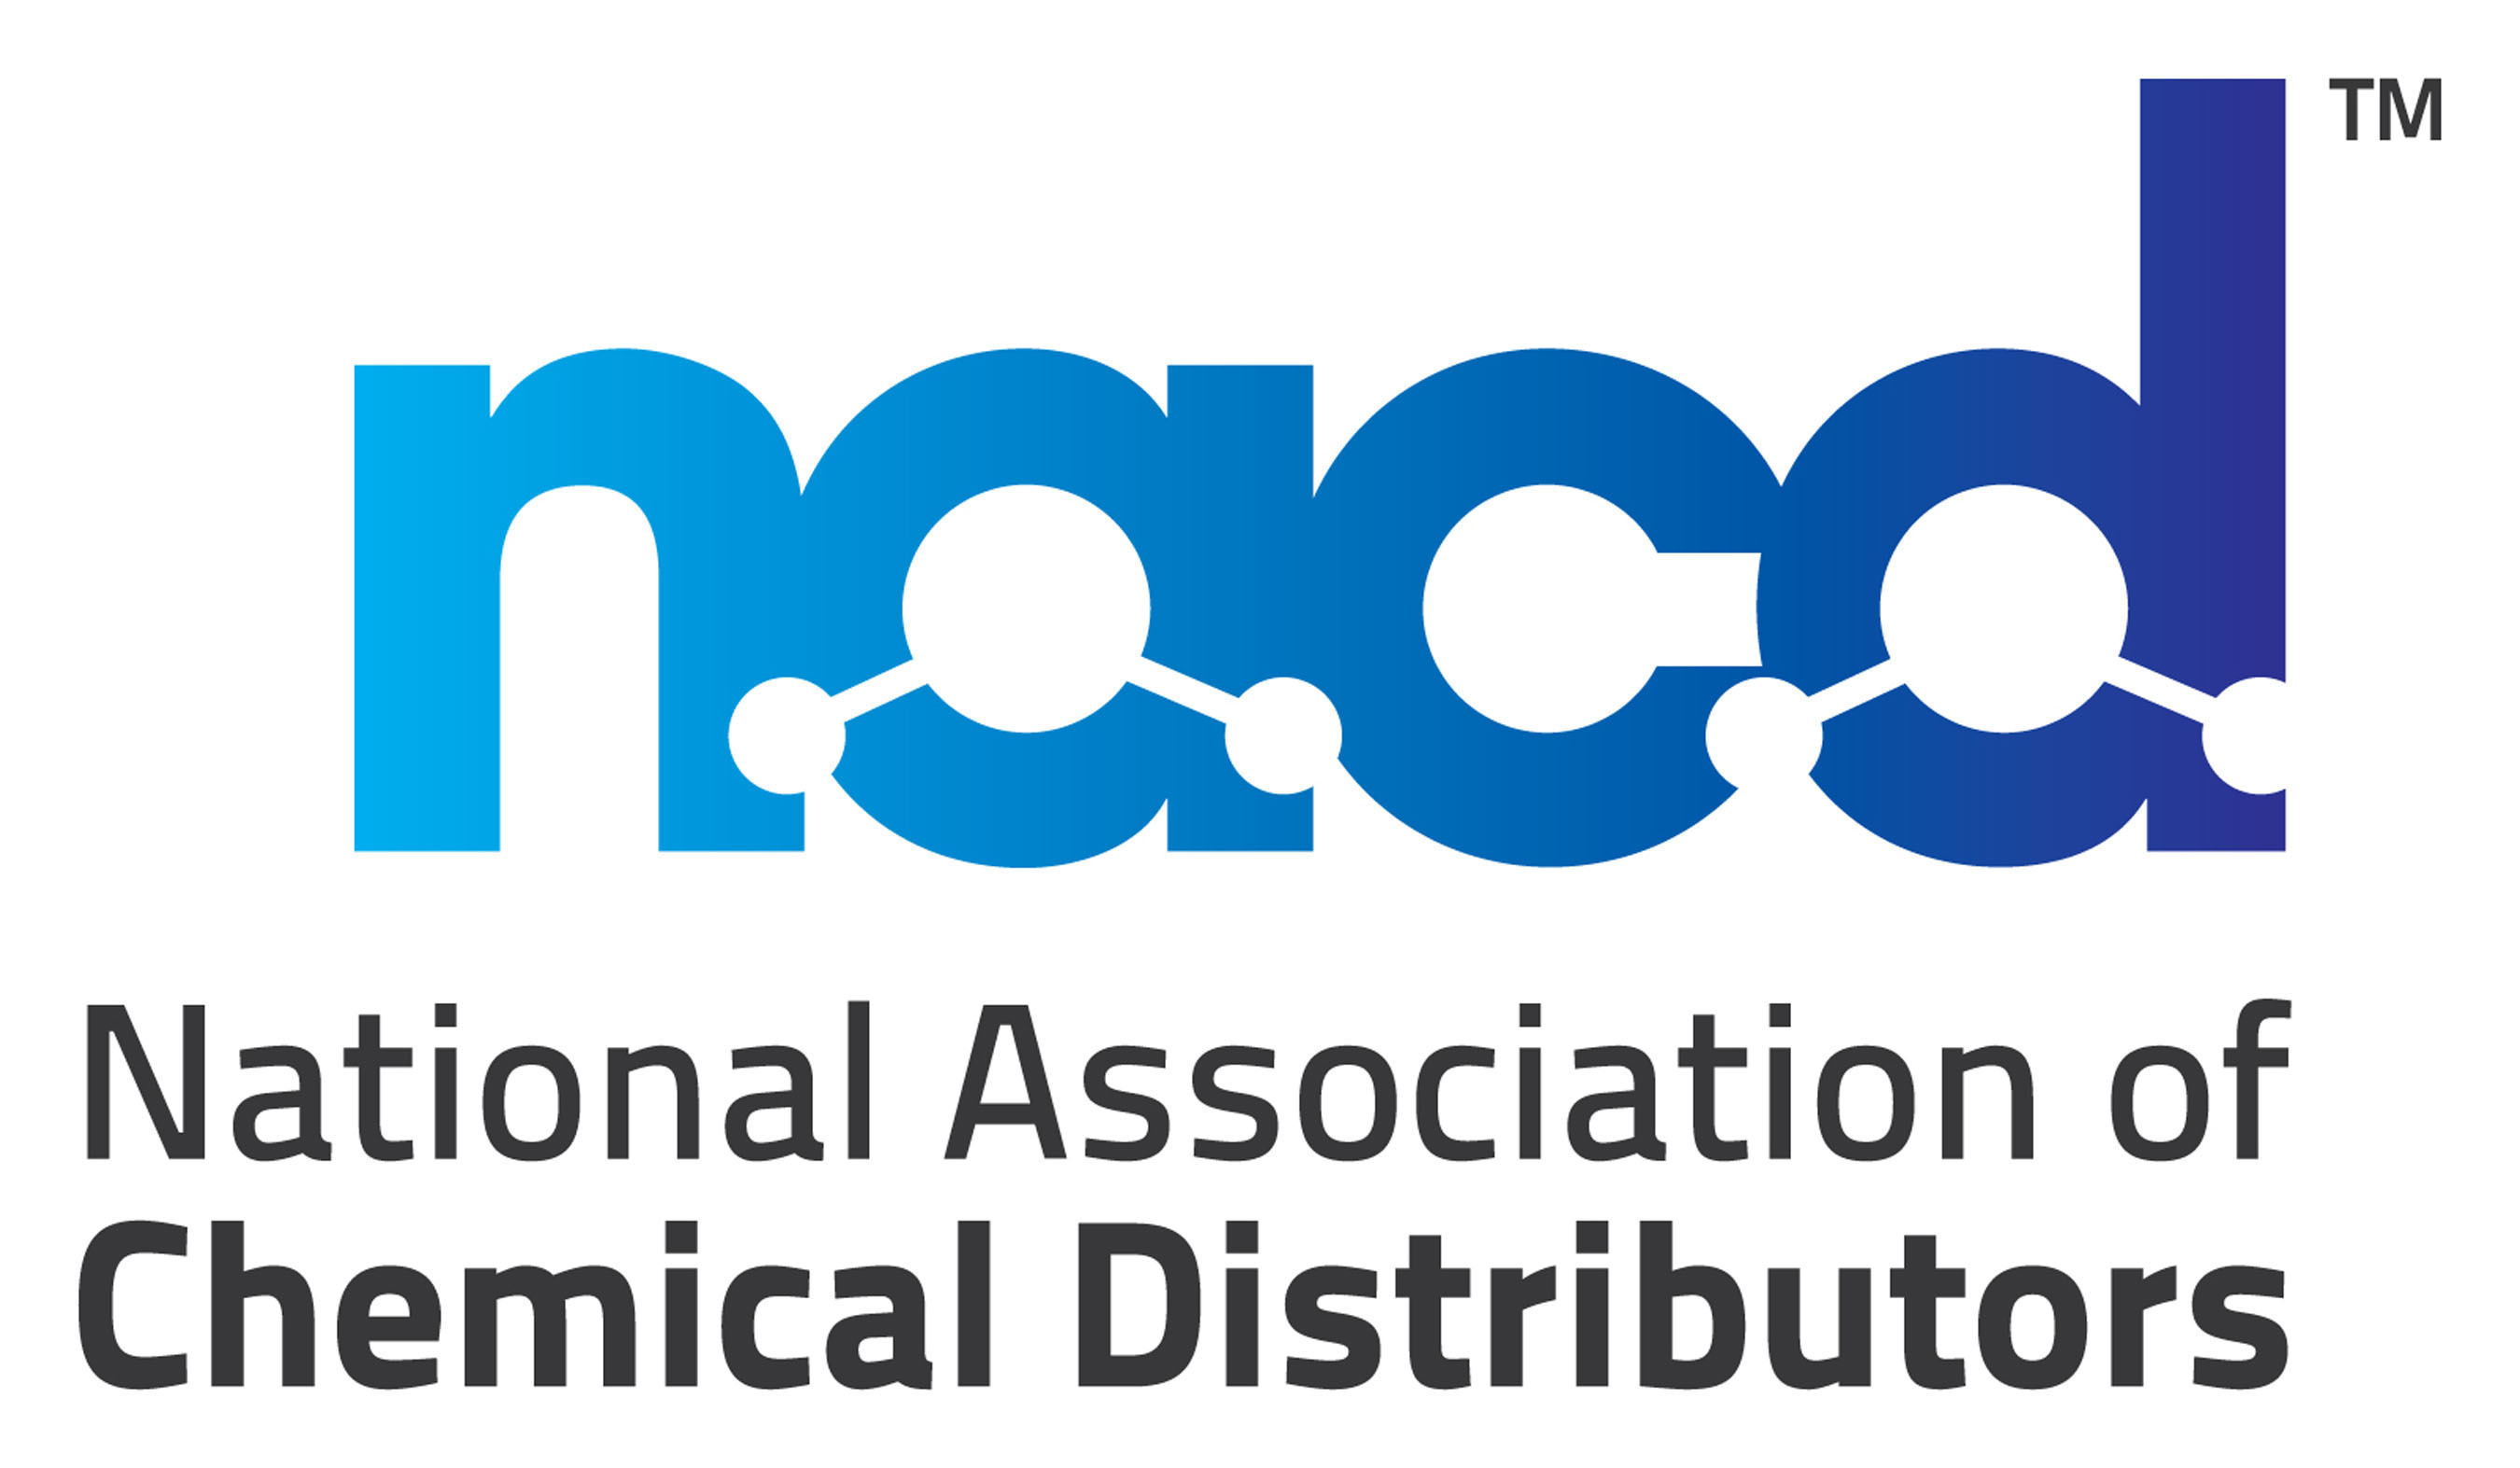 NATIONAL ASSOCIATION OF CHEMICAL DISTRIBUTORS (NACD). (PRNewsFoto/NATIONAL ASSOCIATION OF CHEMICAL DISTRIBUTORS (NACD)) (PRNewsFoto/)